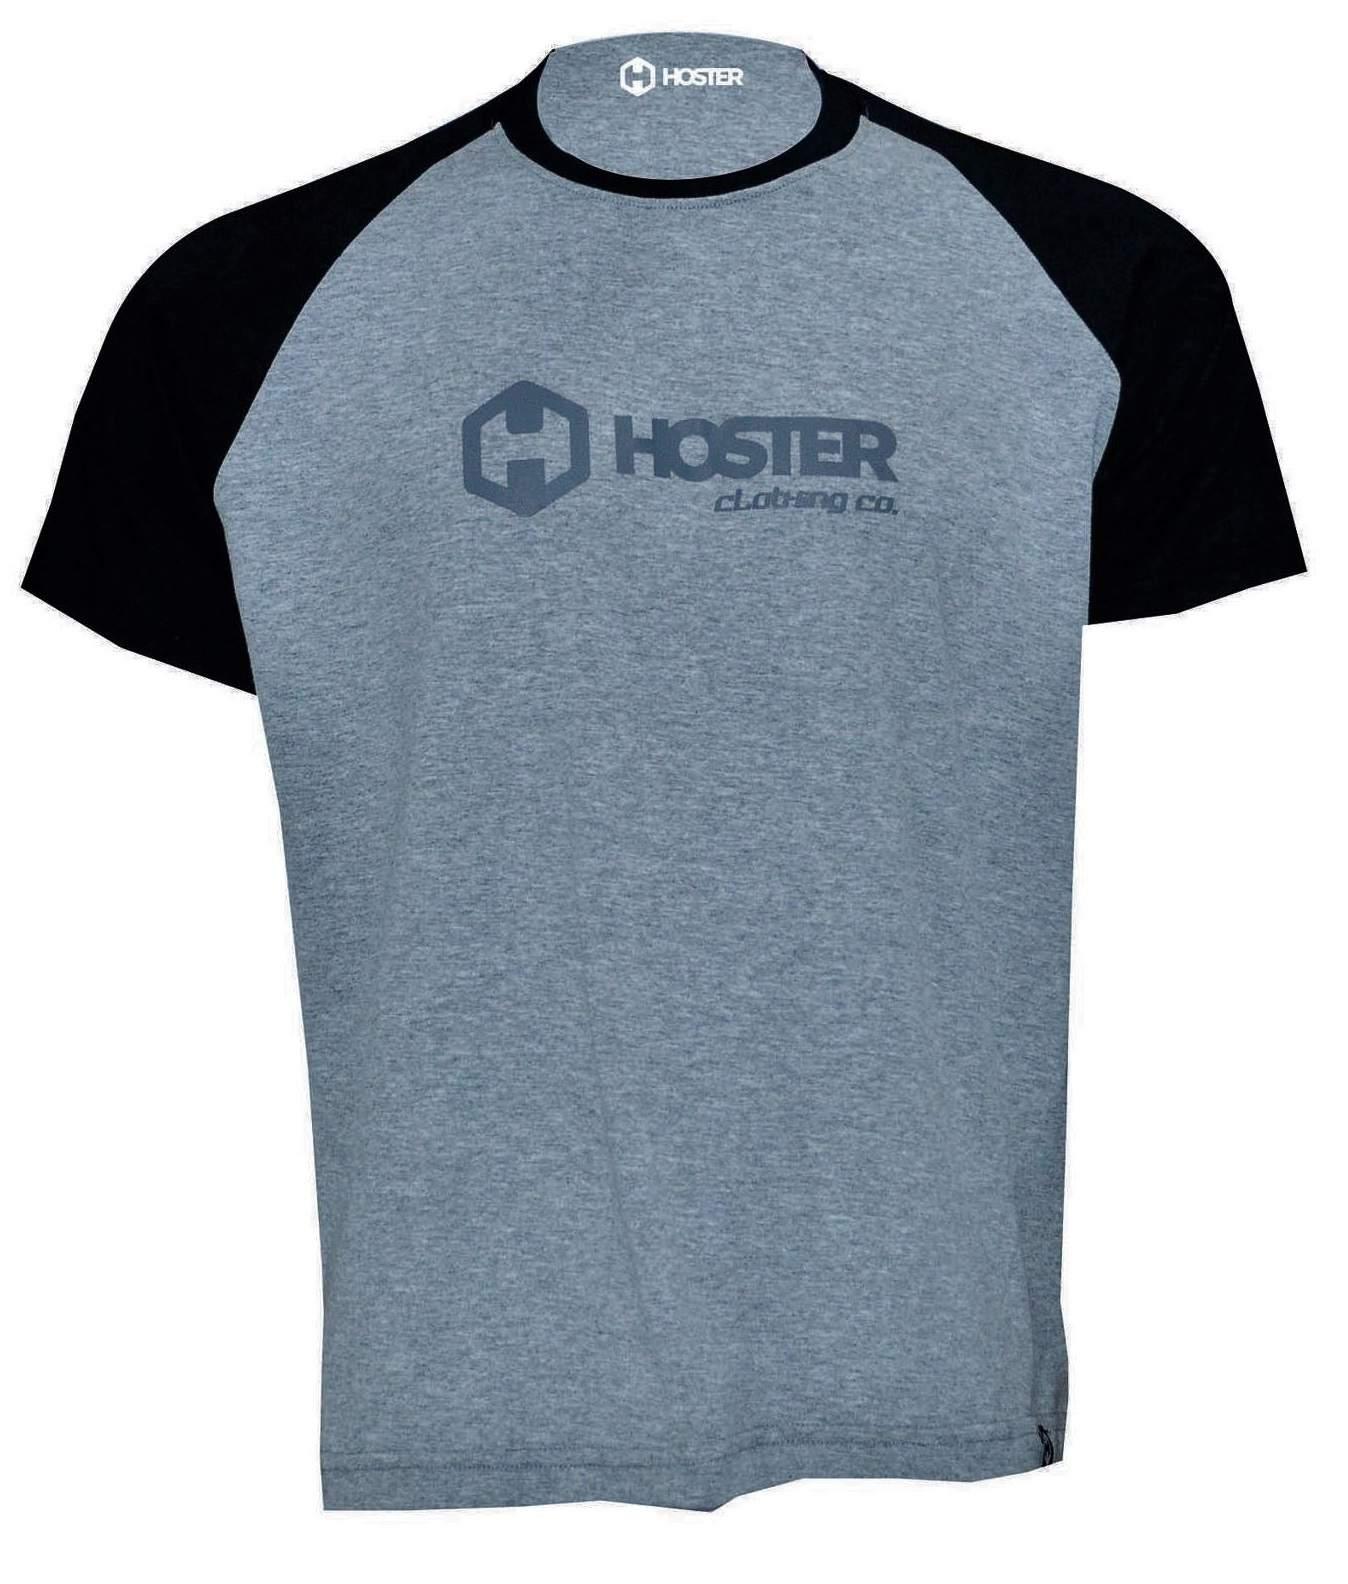 CAMISETA HOSTER CLOTHING RAGLAN CINZA MESCLA/PRETO